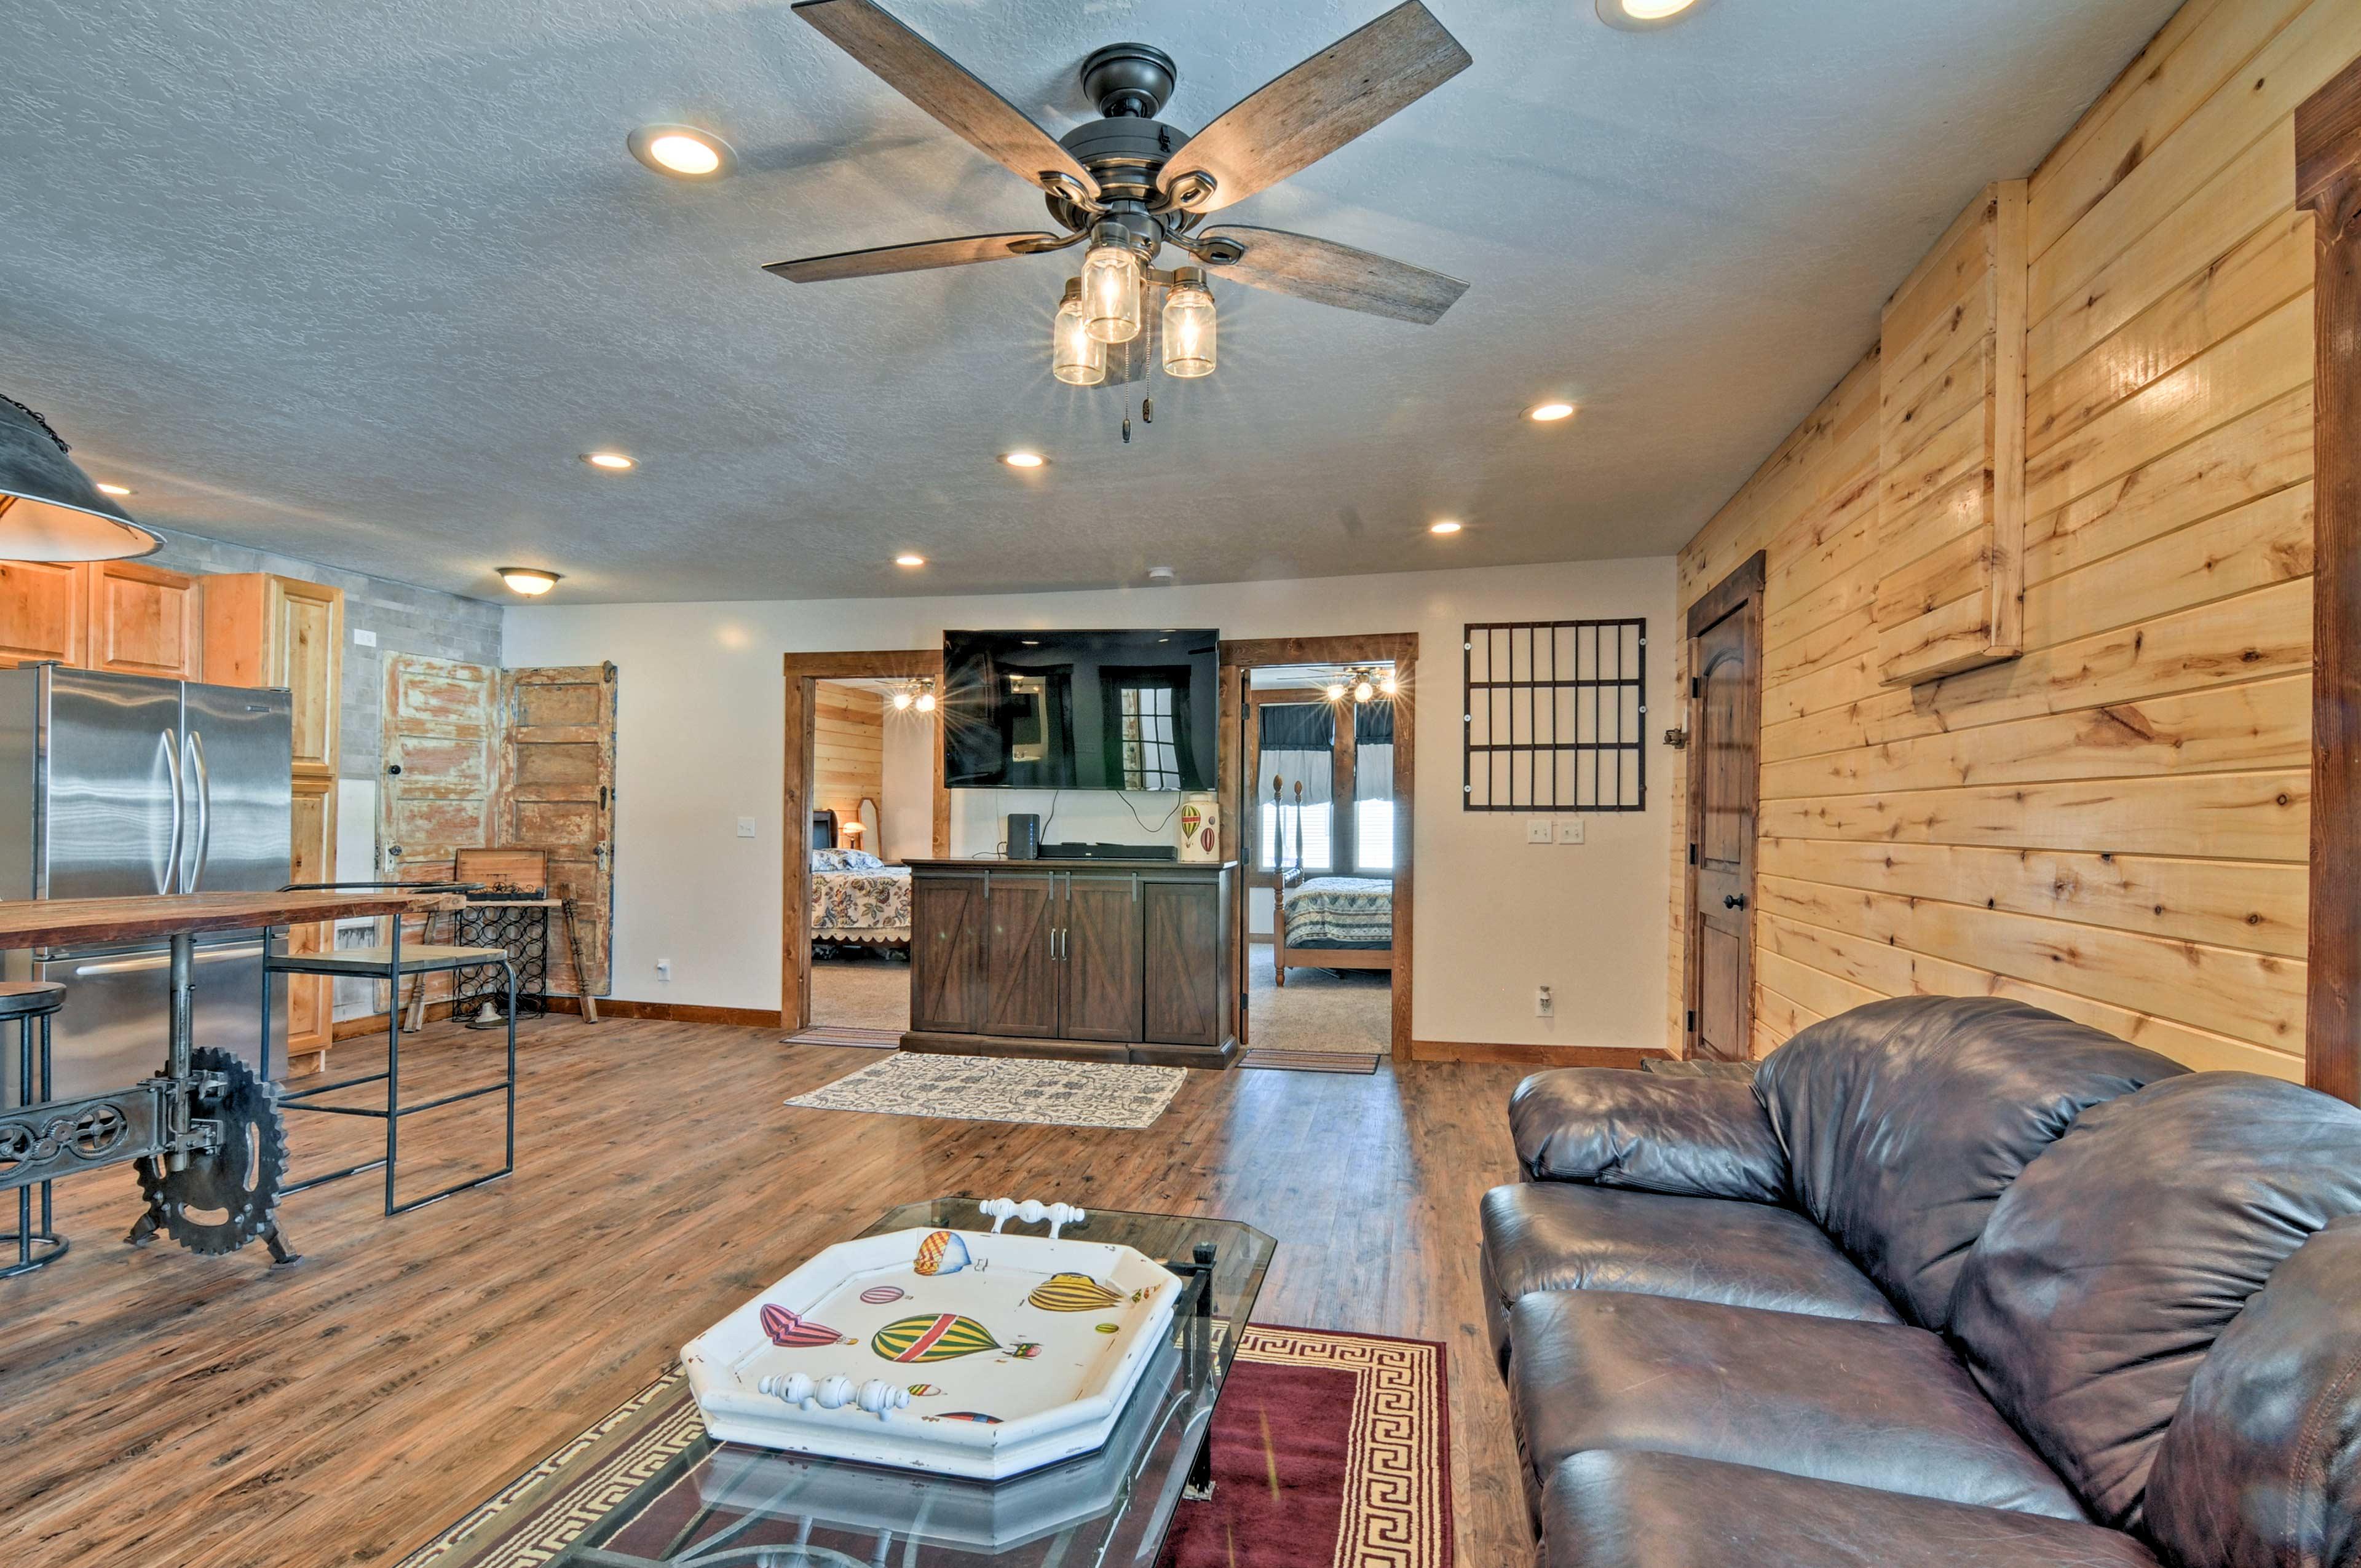 Living Room | 70-Inch Smart TV